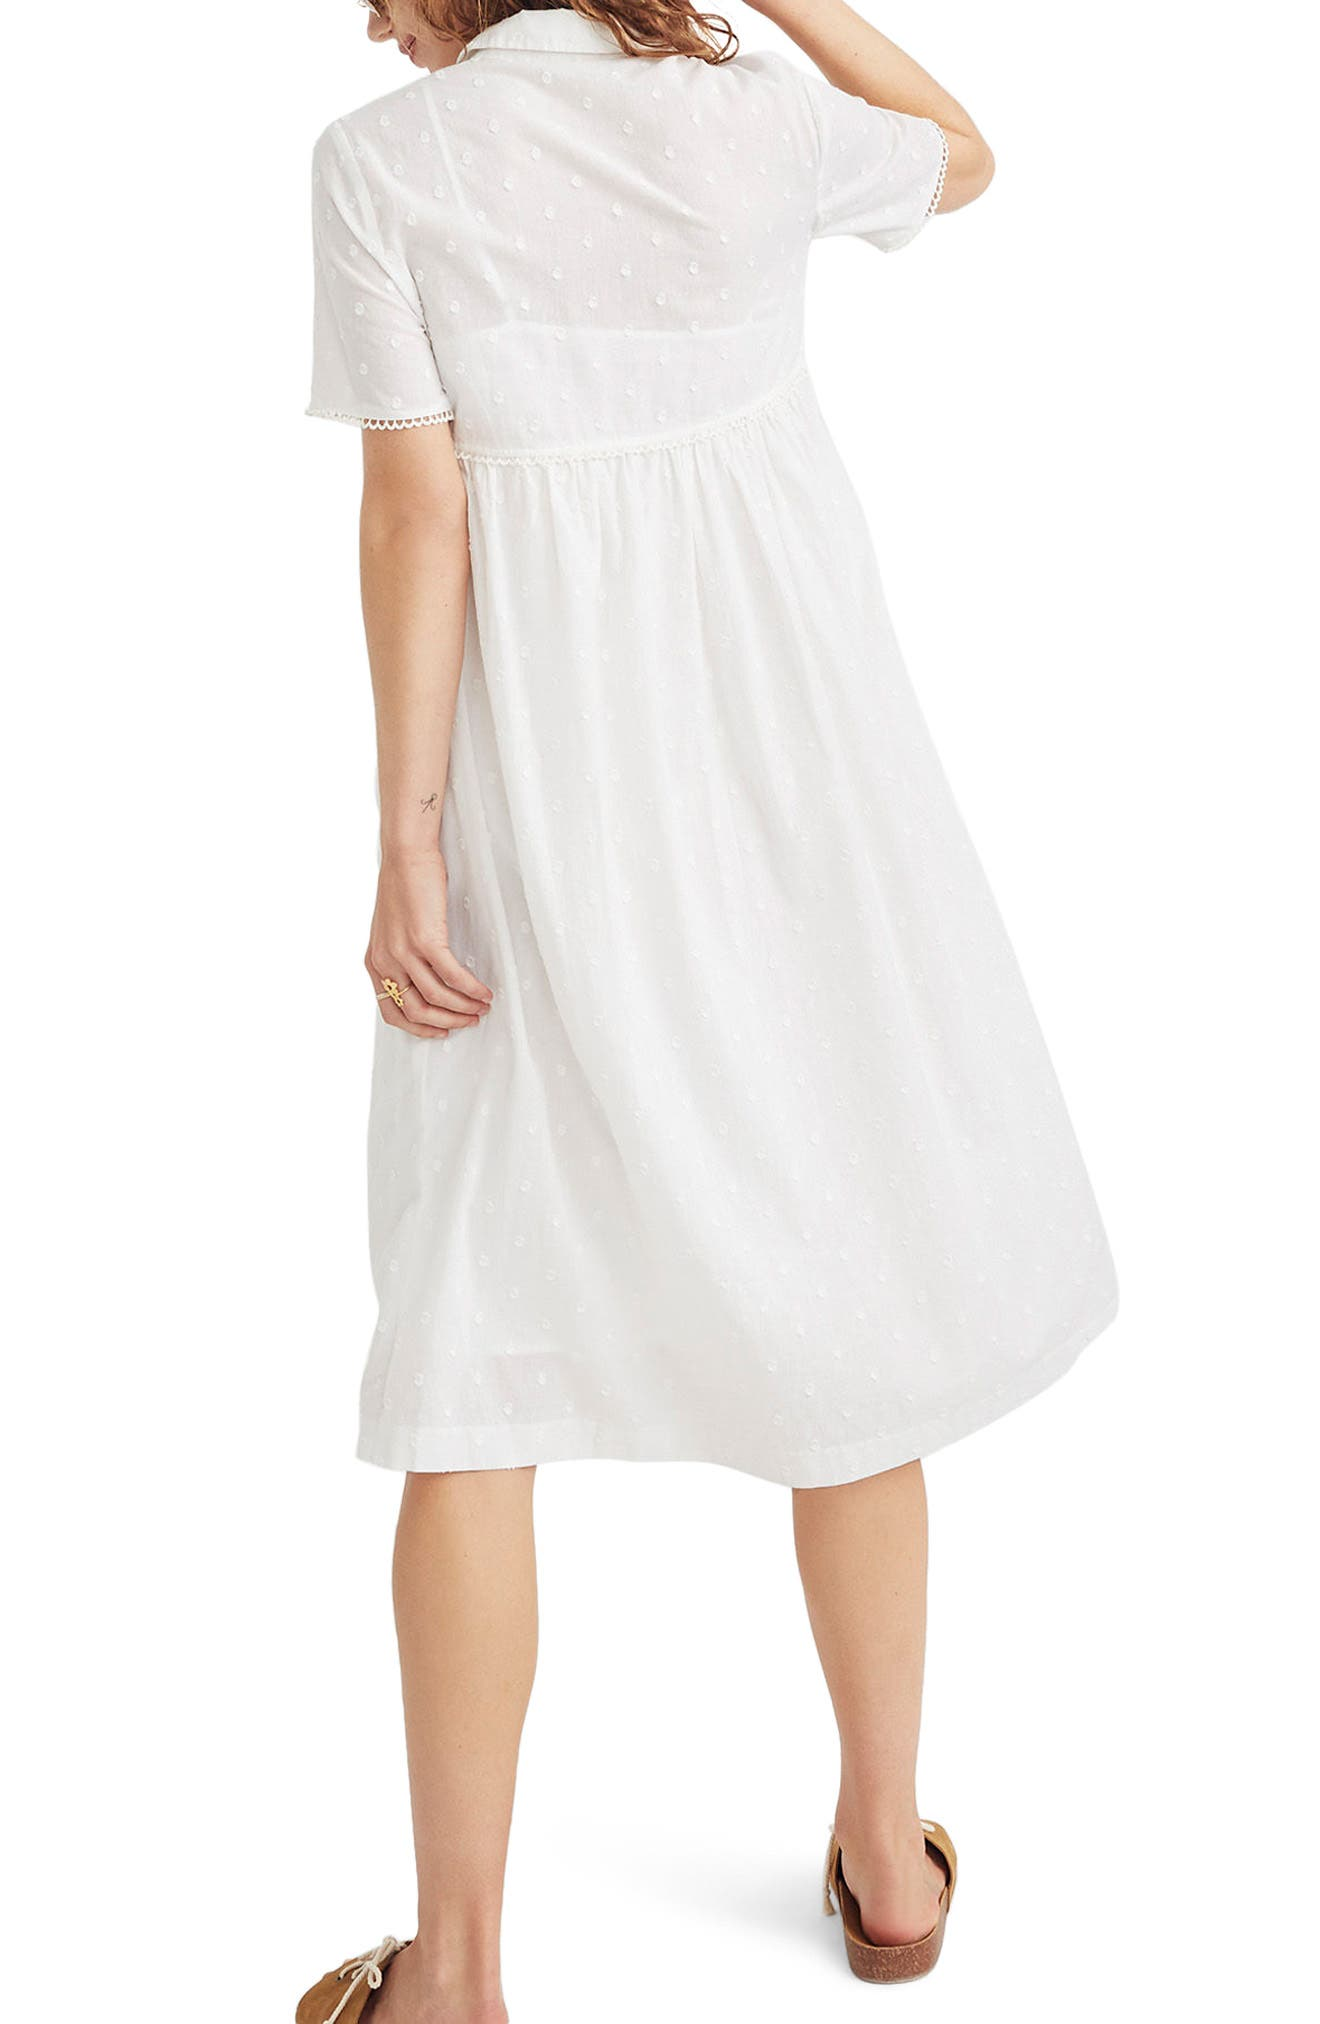 Clipdot Midi Shirtdress,                             Alternate thumbnail 2, color,                             EYELET WHITE